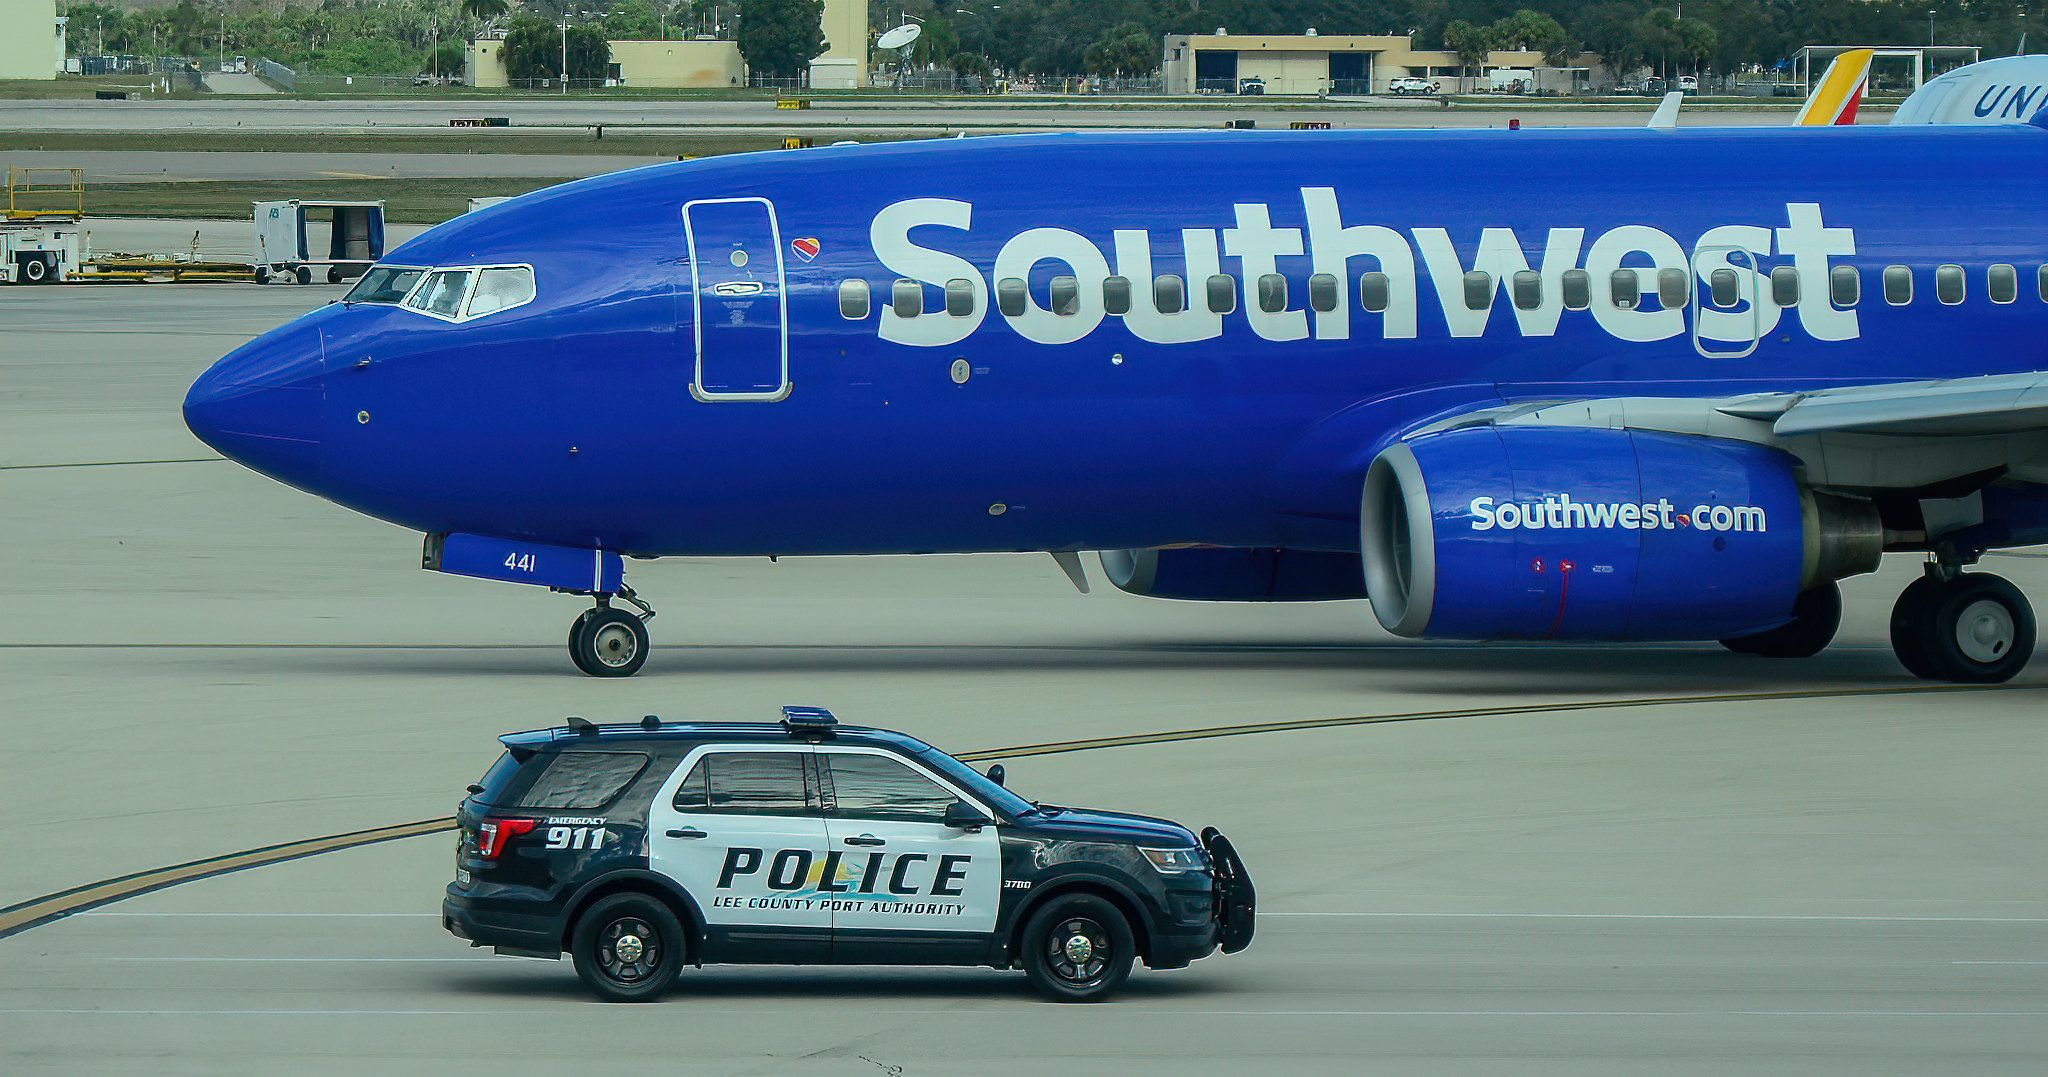 N441wn Southwest Airlines Boeing 737 7h4 S N 29837 In 2021 Southwest Airlines Boeing 737 Southwest Florida International Airport